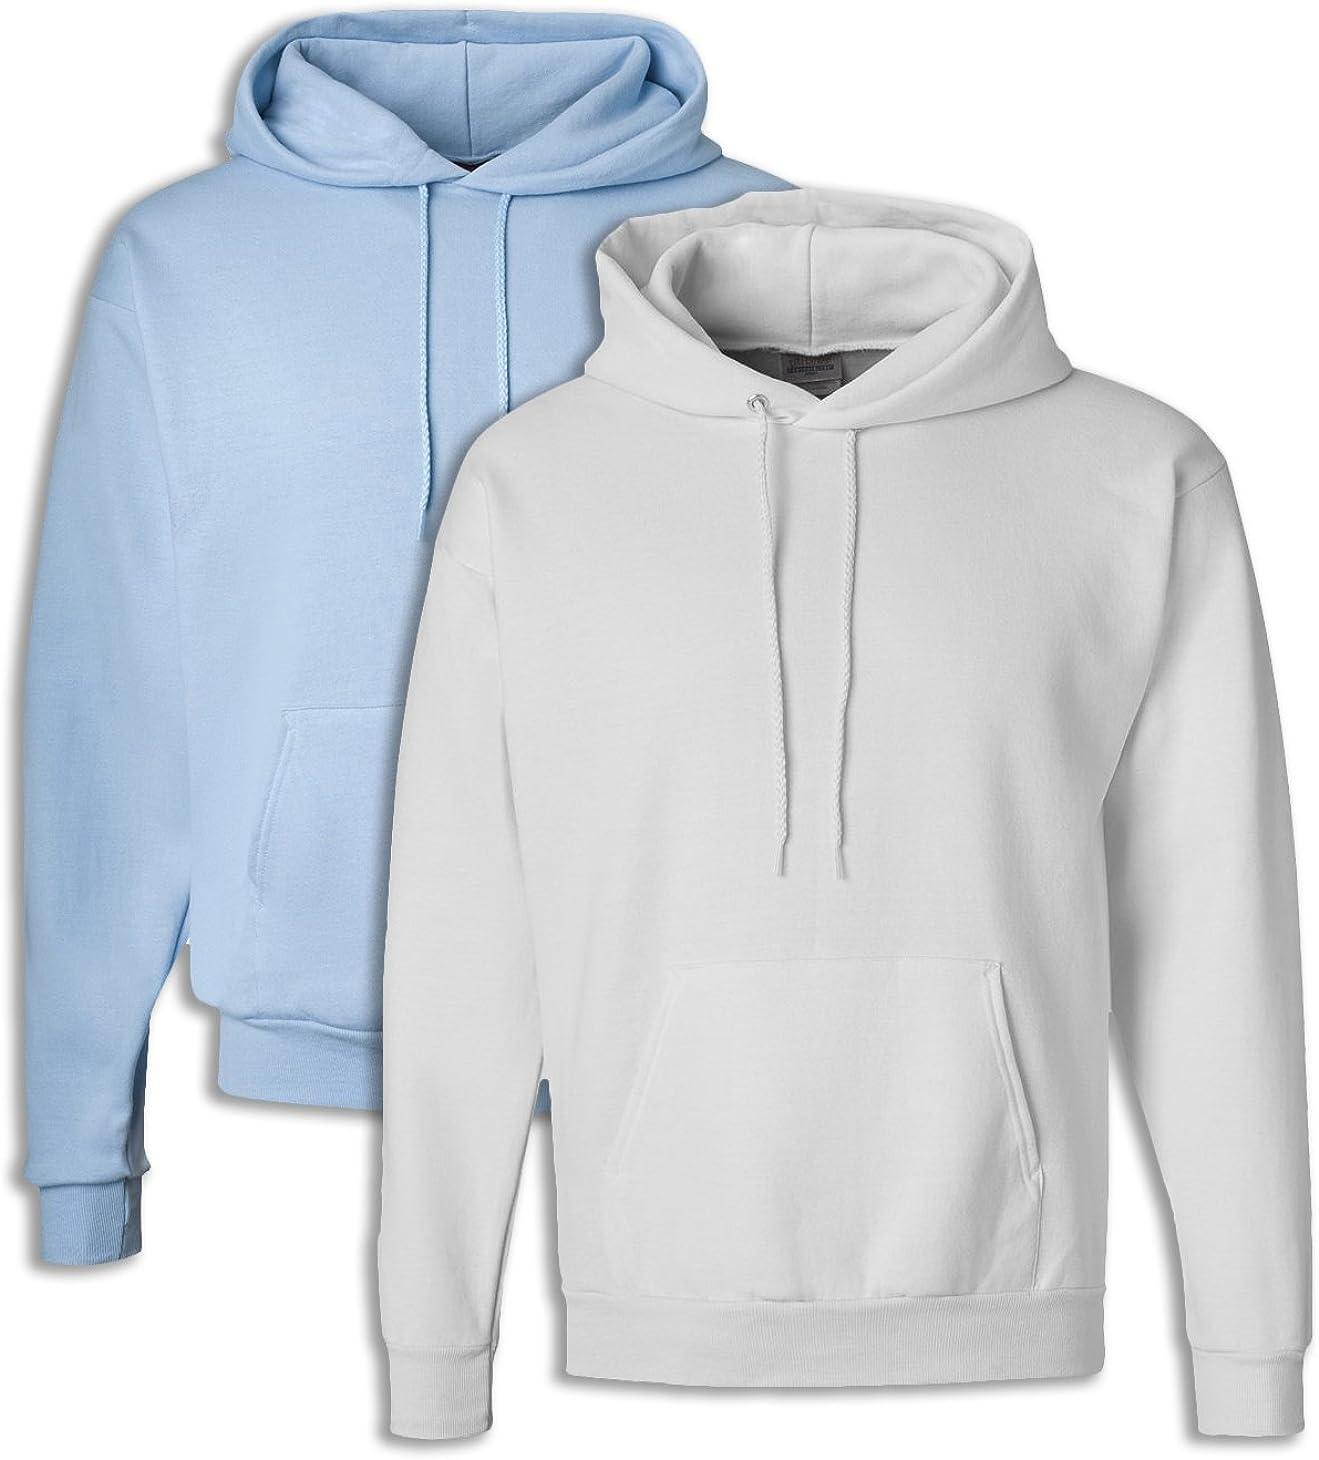 1 White Hanes P170 Mens EcoSmart Hooded Sweatshirt 2XL 1 Light Blue